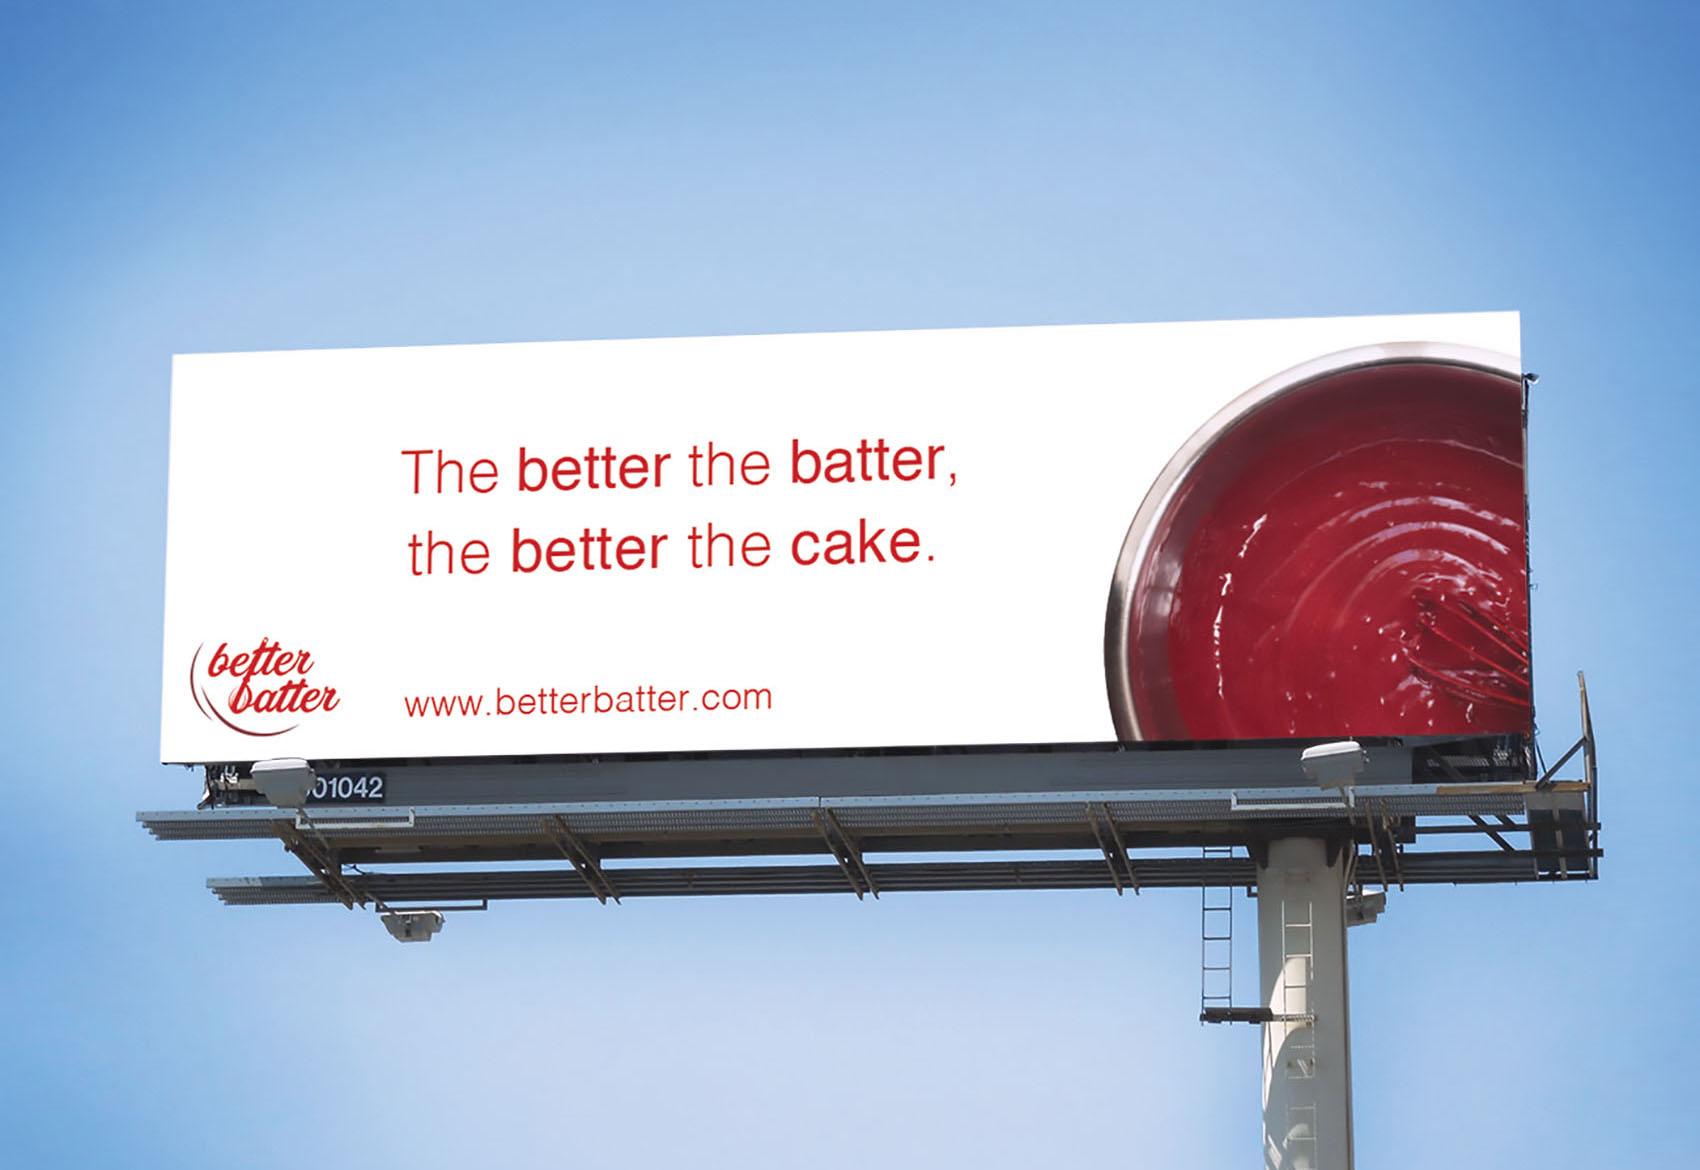 Better Batter Billboard Ad